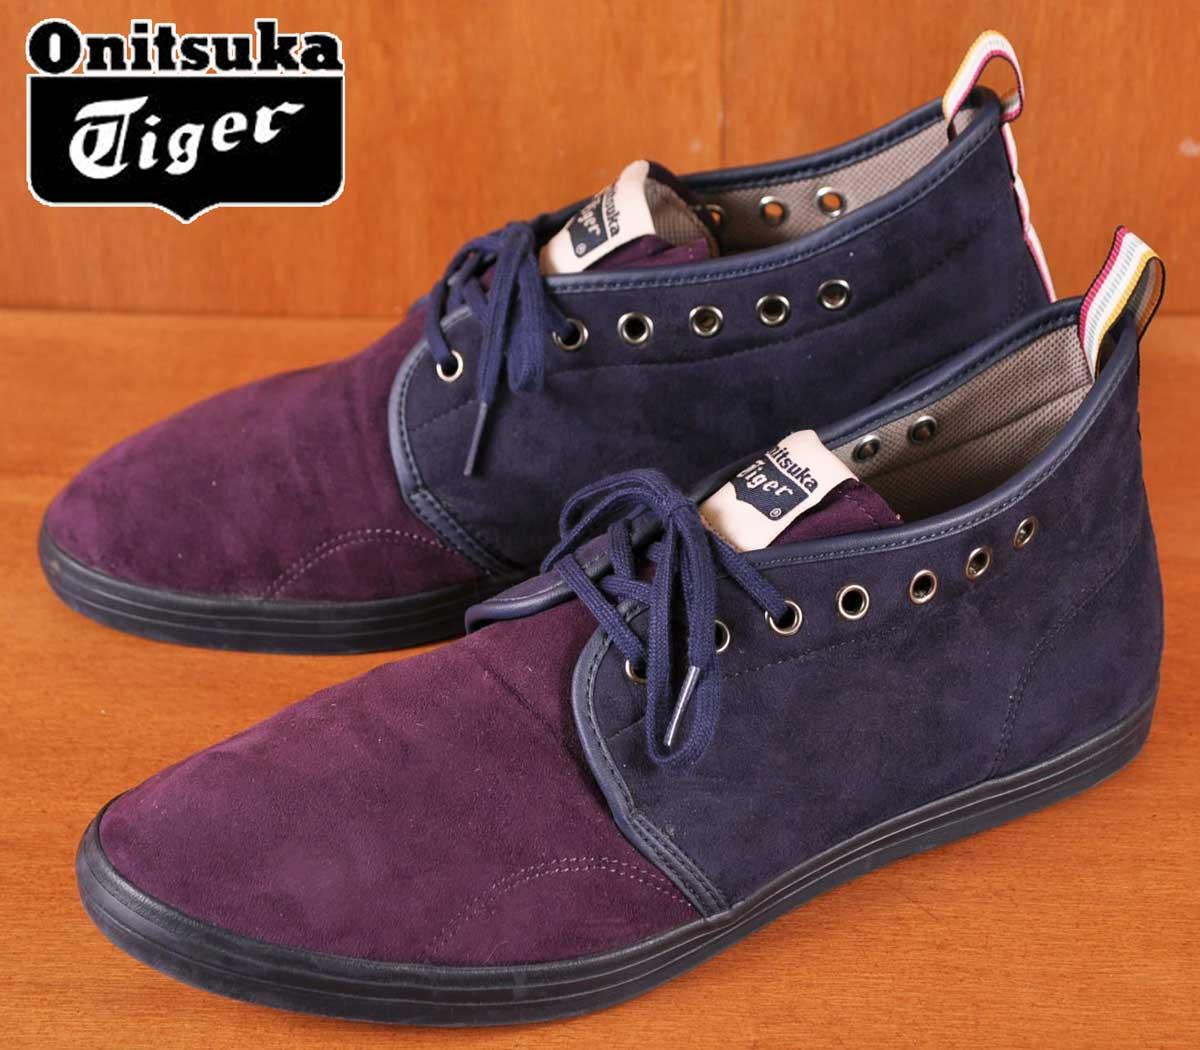 new style 52514 683dd Onitsuka Tiger Onitsuka tiger TWEENY CHUKKA トゥイーニーチャッカ TH0D1Y mid cut  sneakers purple X navy JPN28 .0cm▽